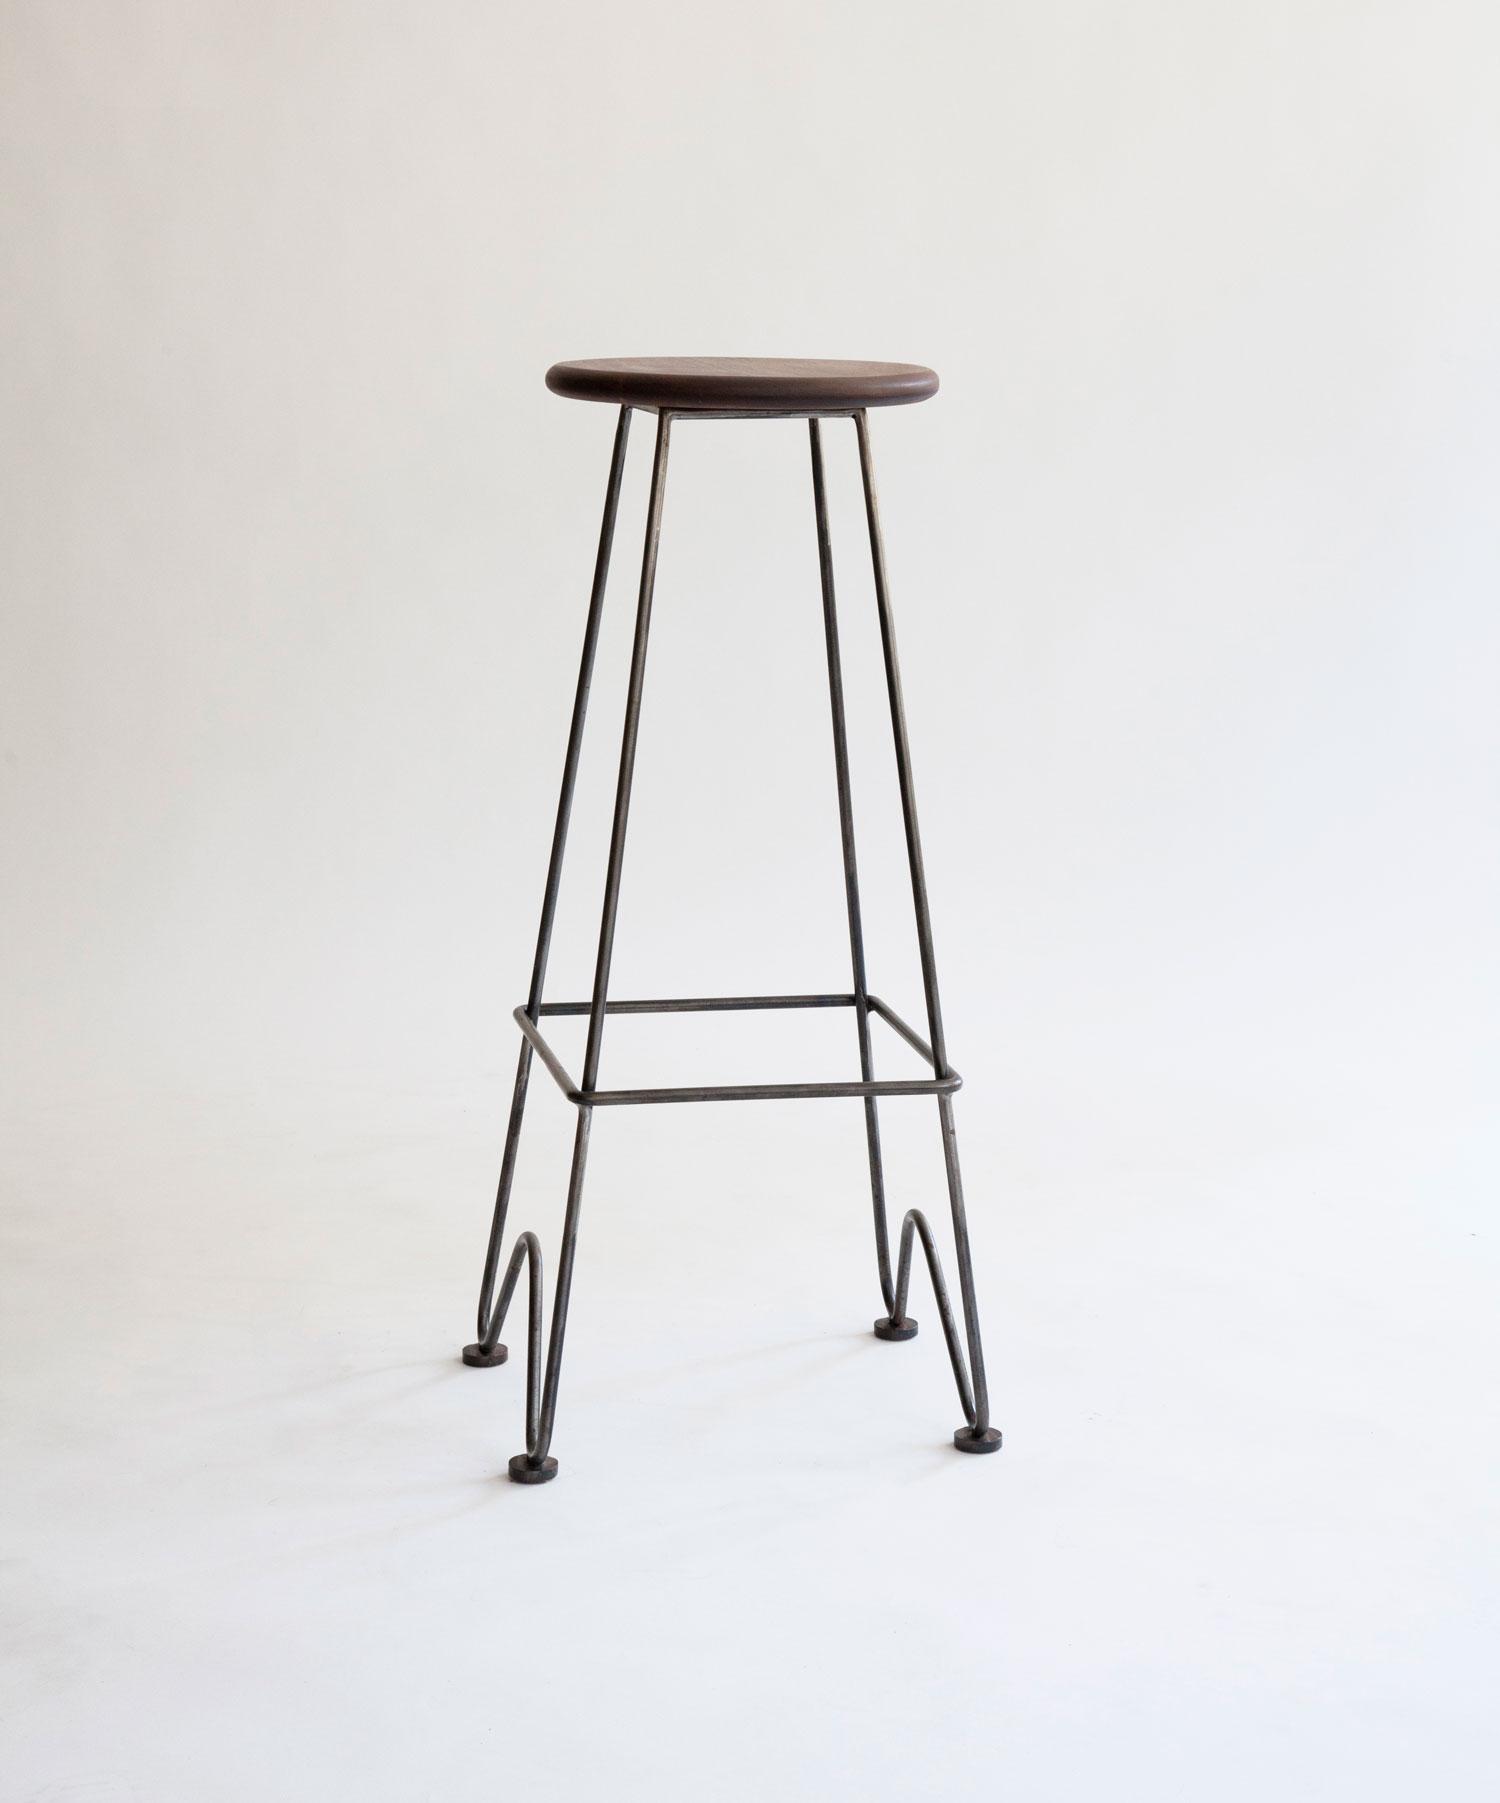 metal-and-wood-seating-chair-stool-fish.jpg